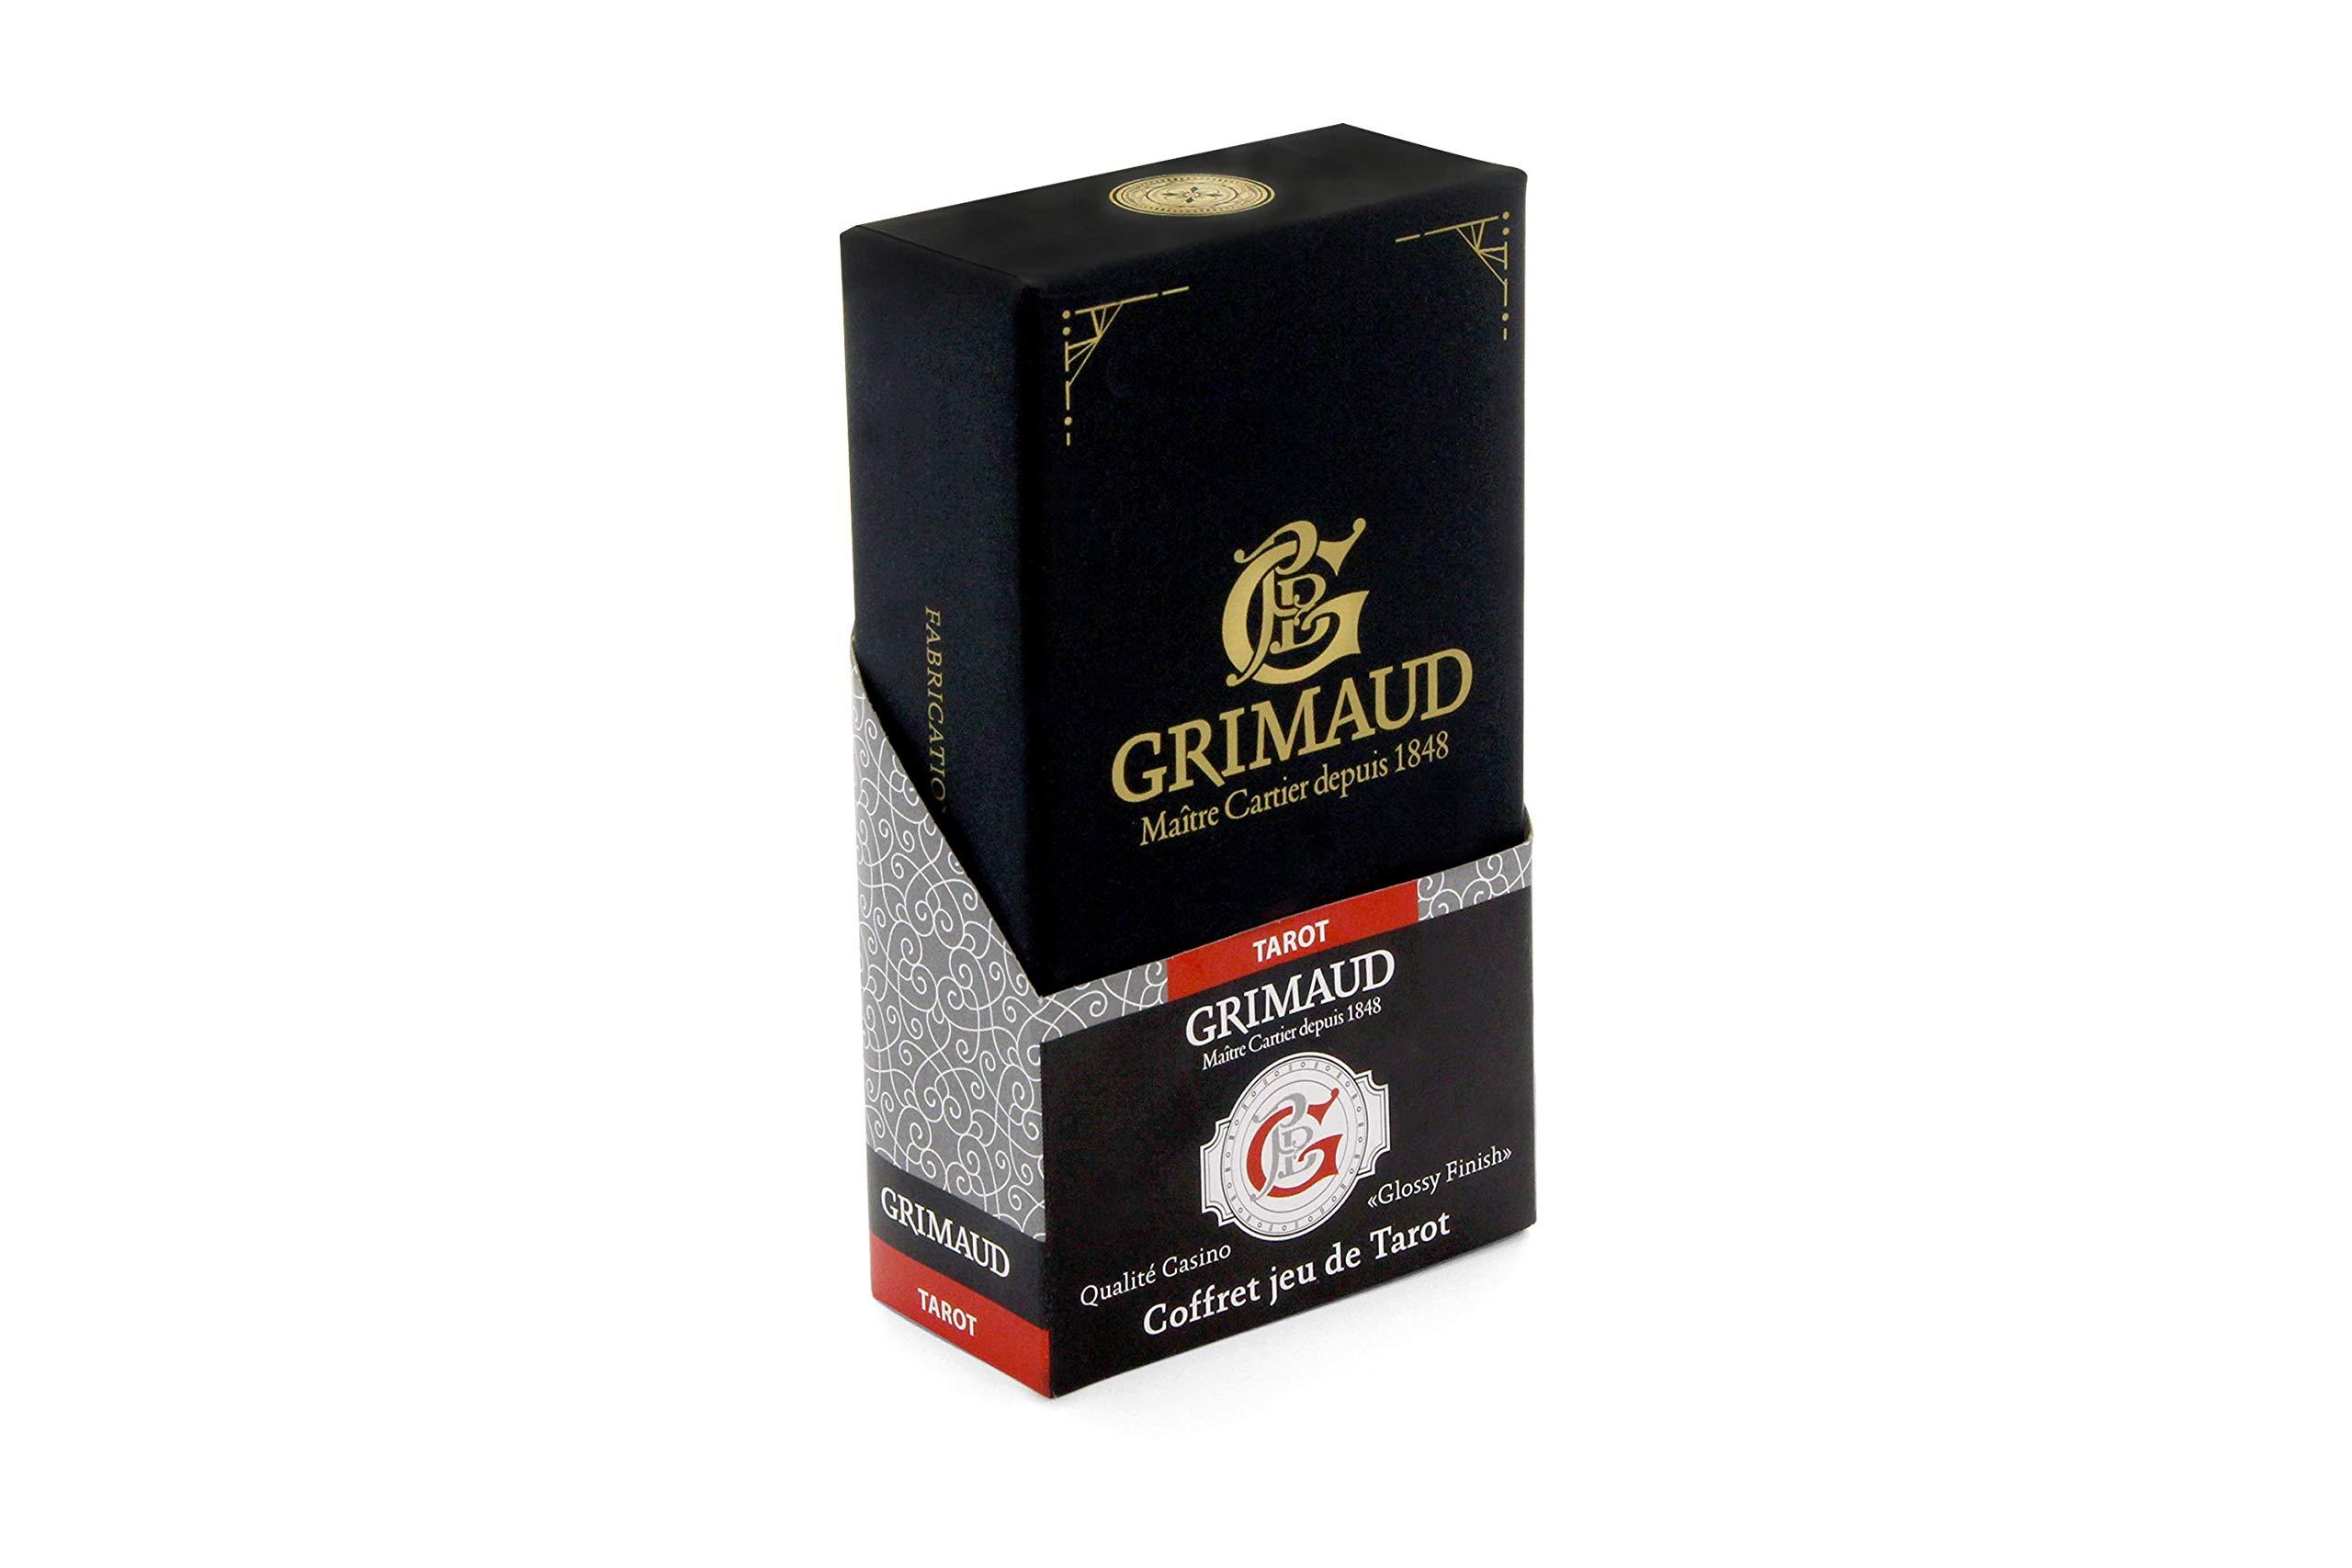 Grimaud Expert 130007958 Tarot Card Box Black by Grimaud